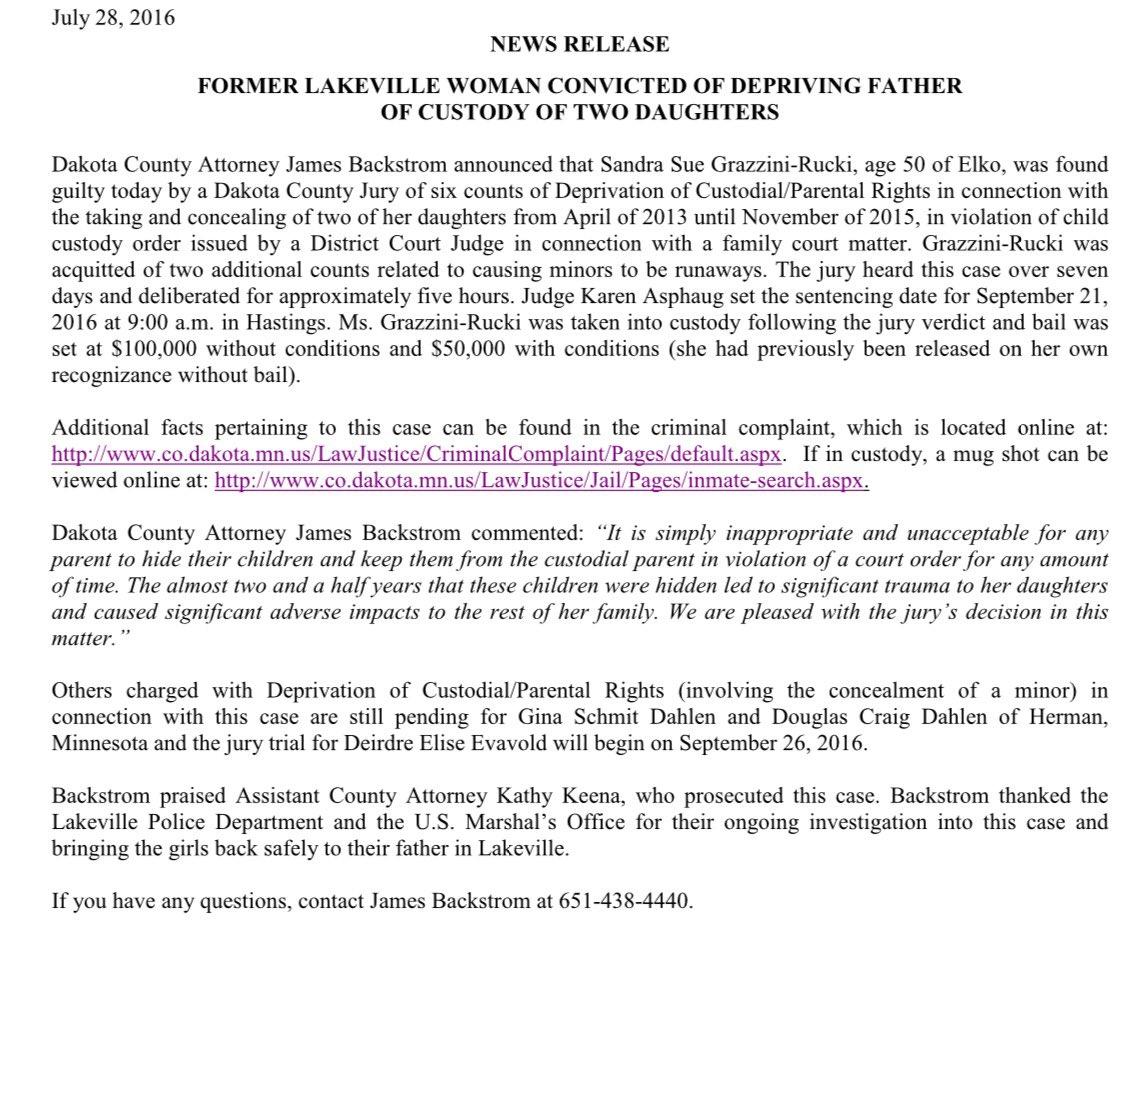 Via press release: Statement from Dakota County Attorney Backstrom on Grazzini-Rucki's conviction. #grazzinirucki https://t.co/xCmd8HxLAw